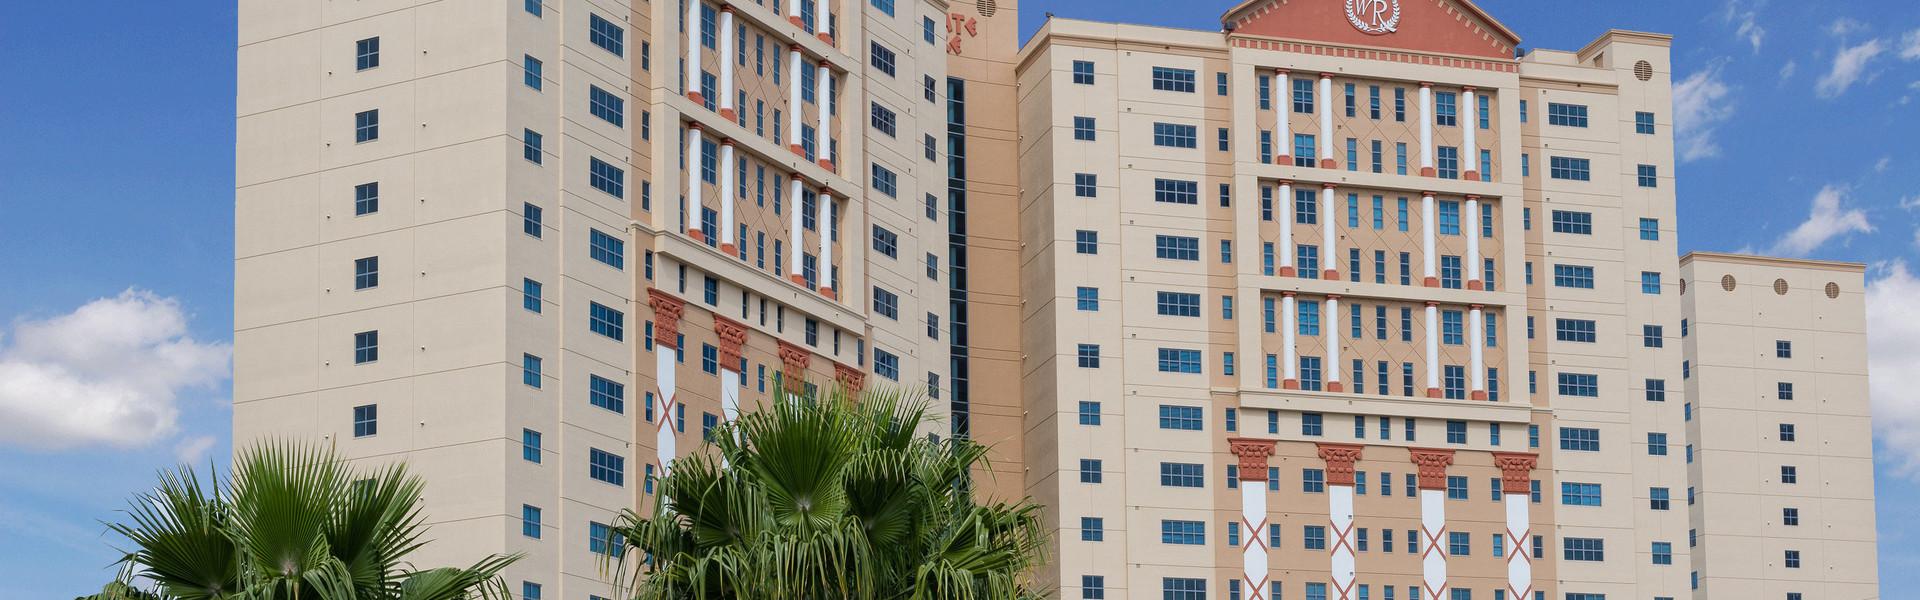 Hotel Specials & Hotel Discounts | Westgate Palace Orlando | Hotel Discounts Near International Drive, Orlando, FL 32819